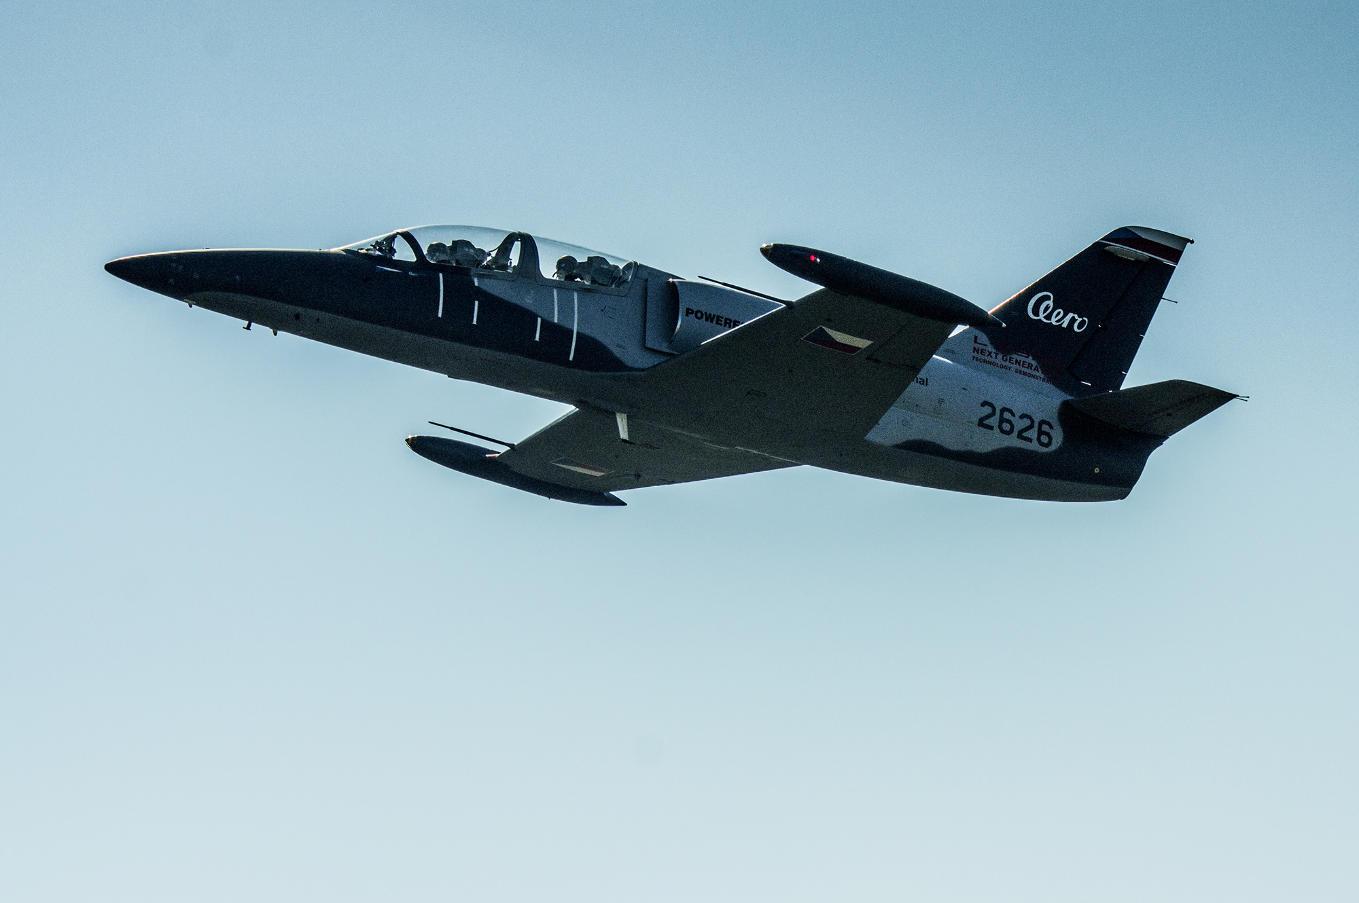 Le L-39NG progresse vers l'industrialisation